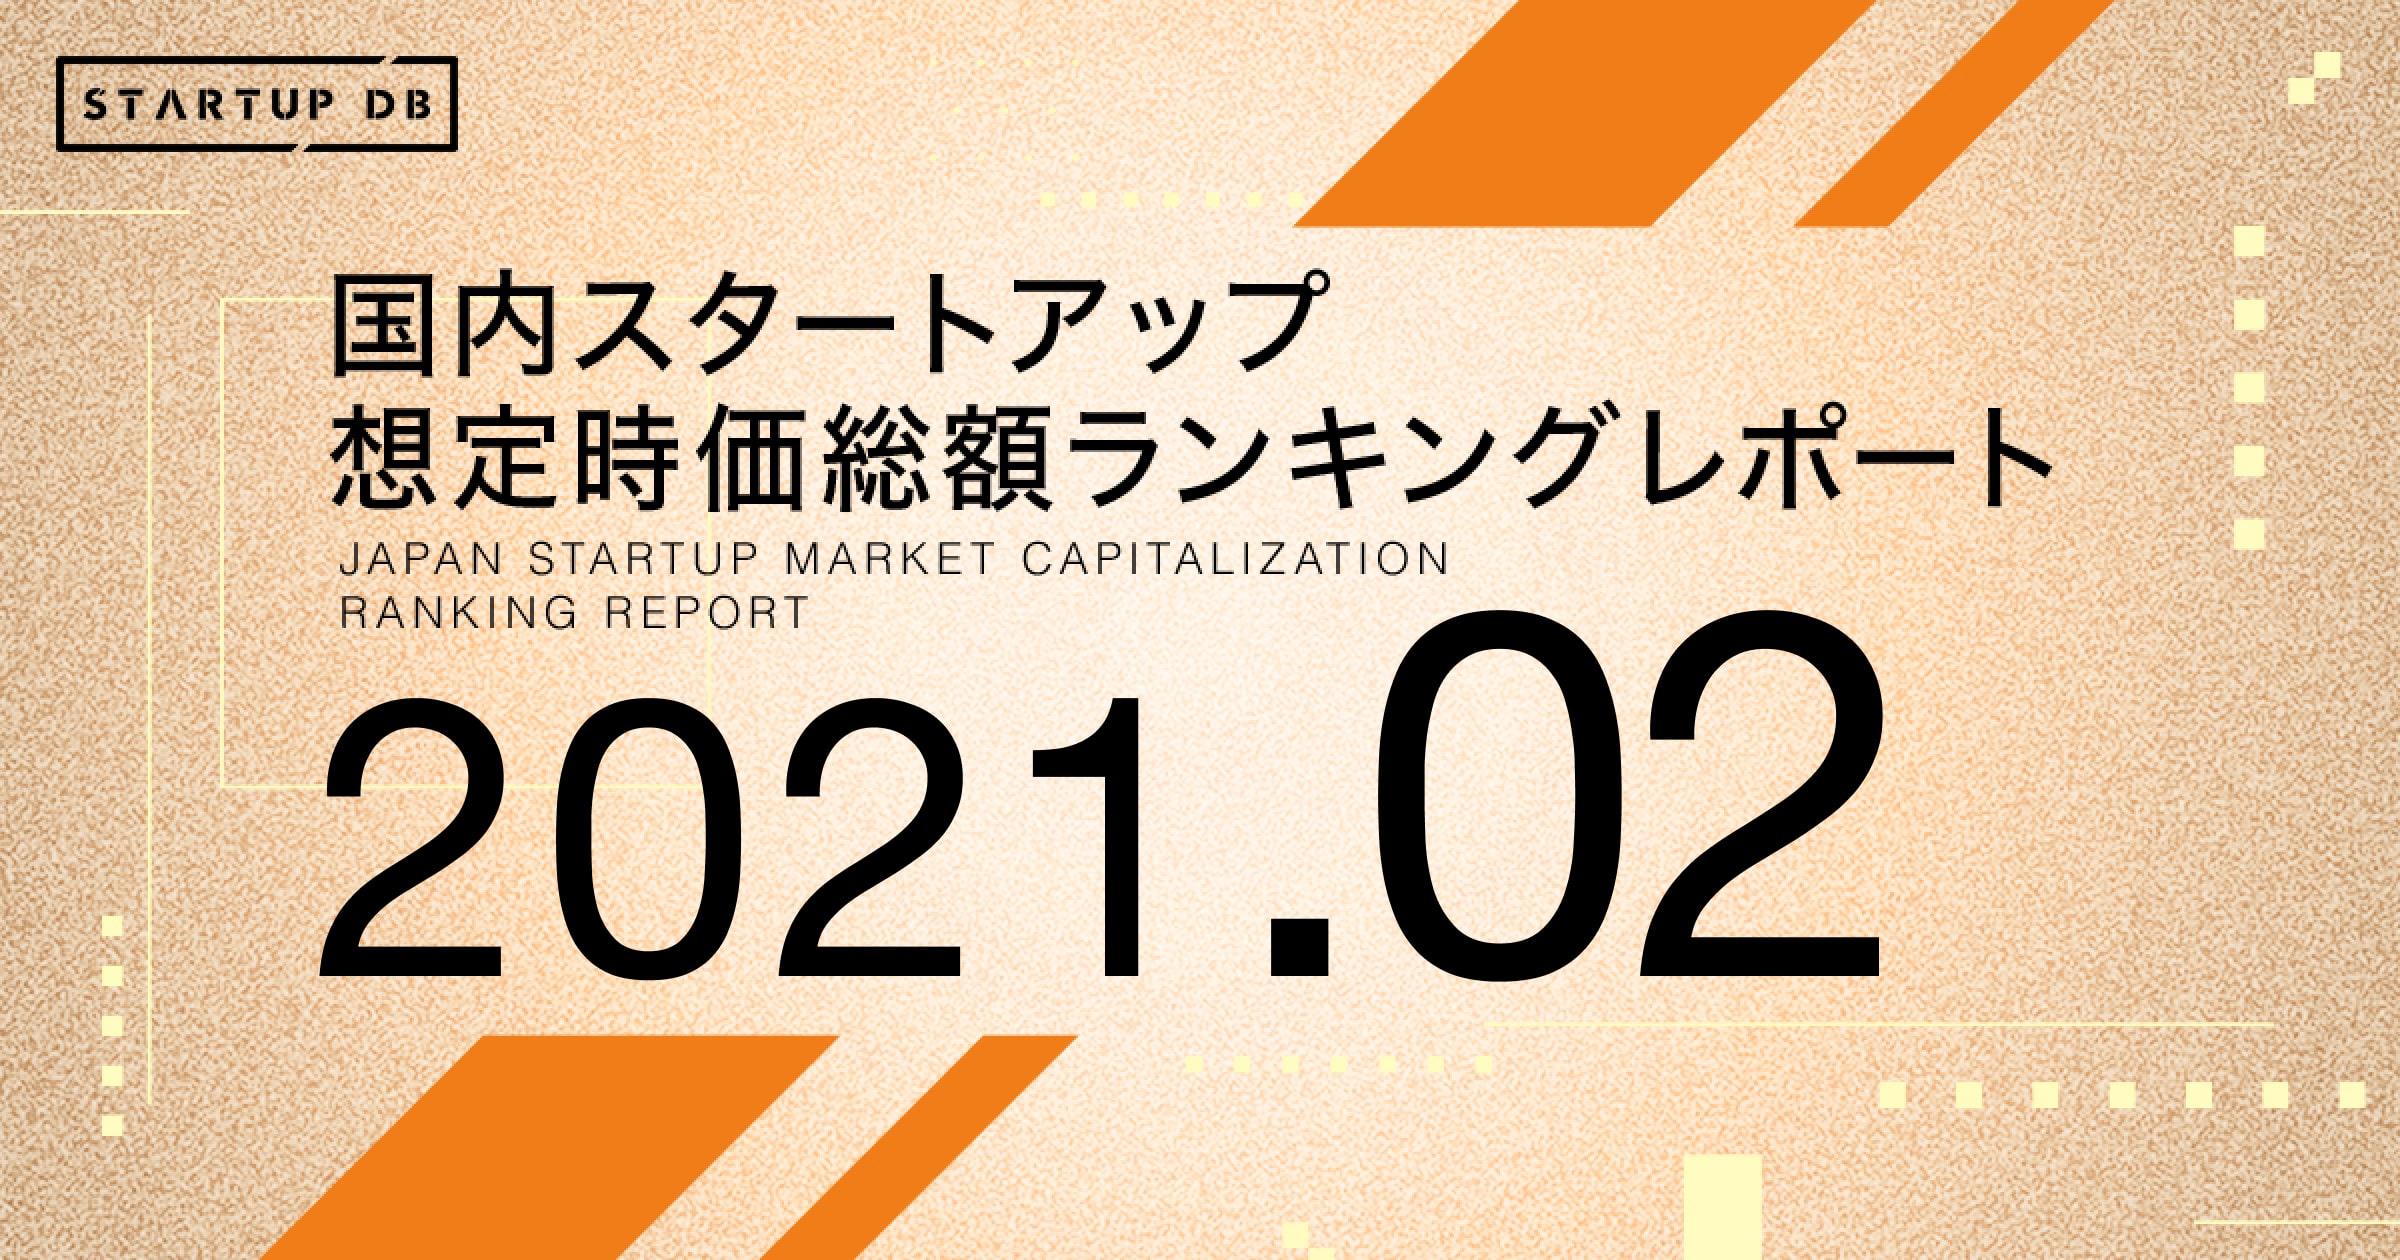 【STARTUP DB】調査結果 国内スタートアップ想定時価総額ランキング(2021年2月)